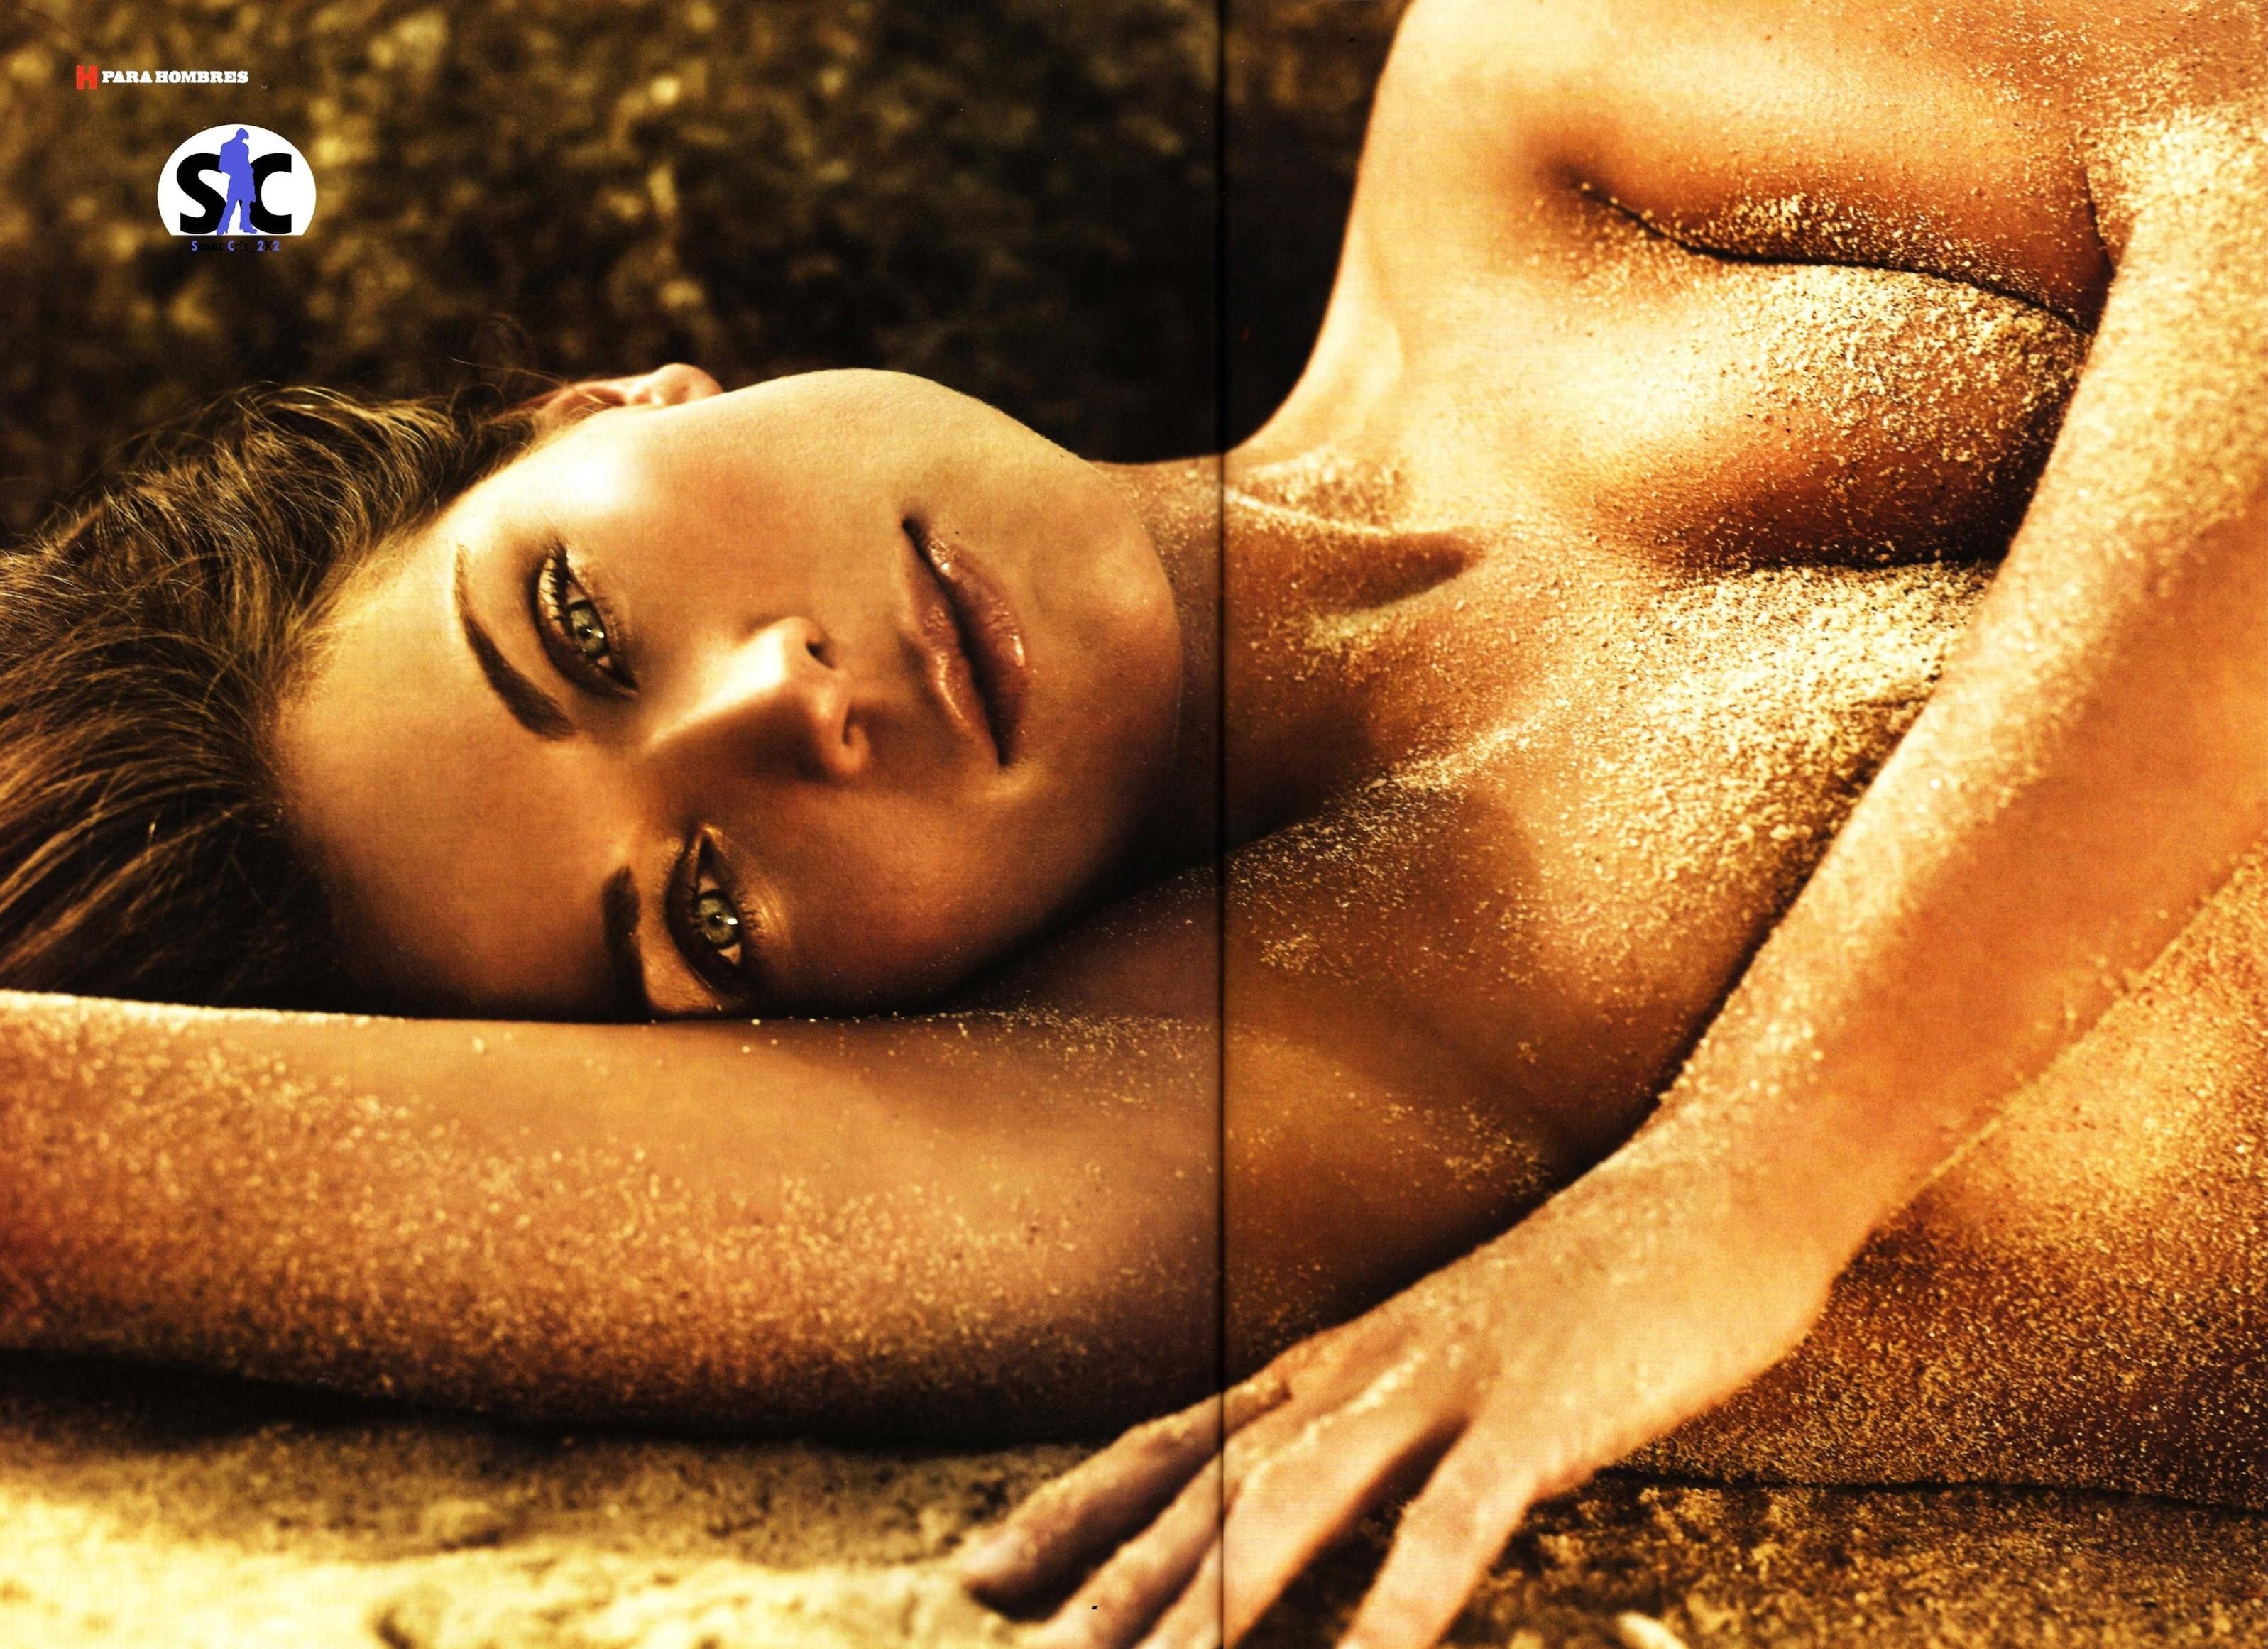 bunny-hot-ludwika-paleta-nudes-naked-photos-videos-fit-naked-drunk